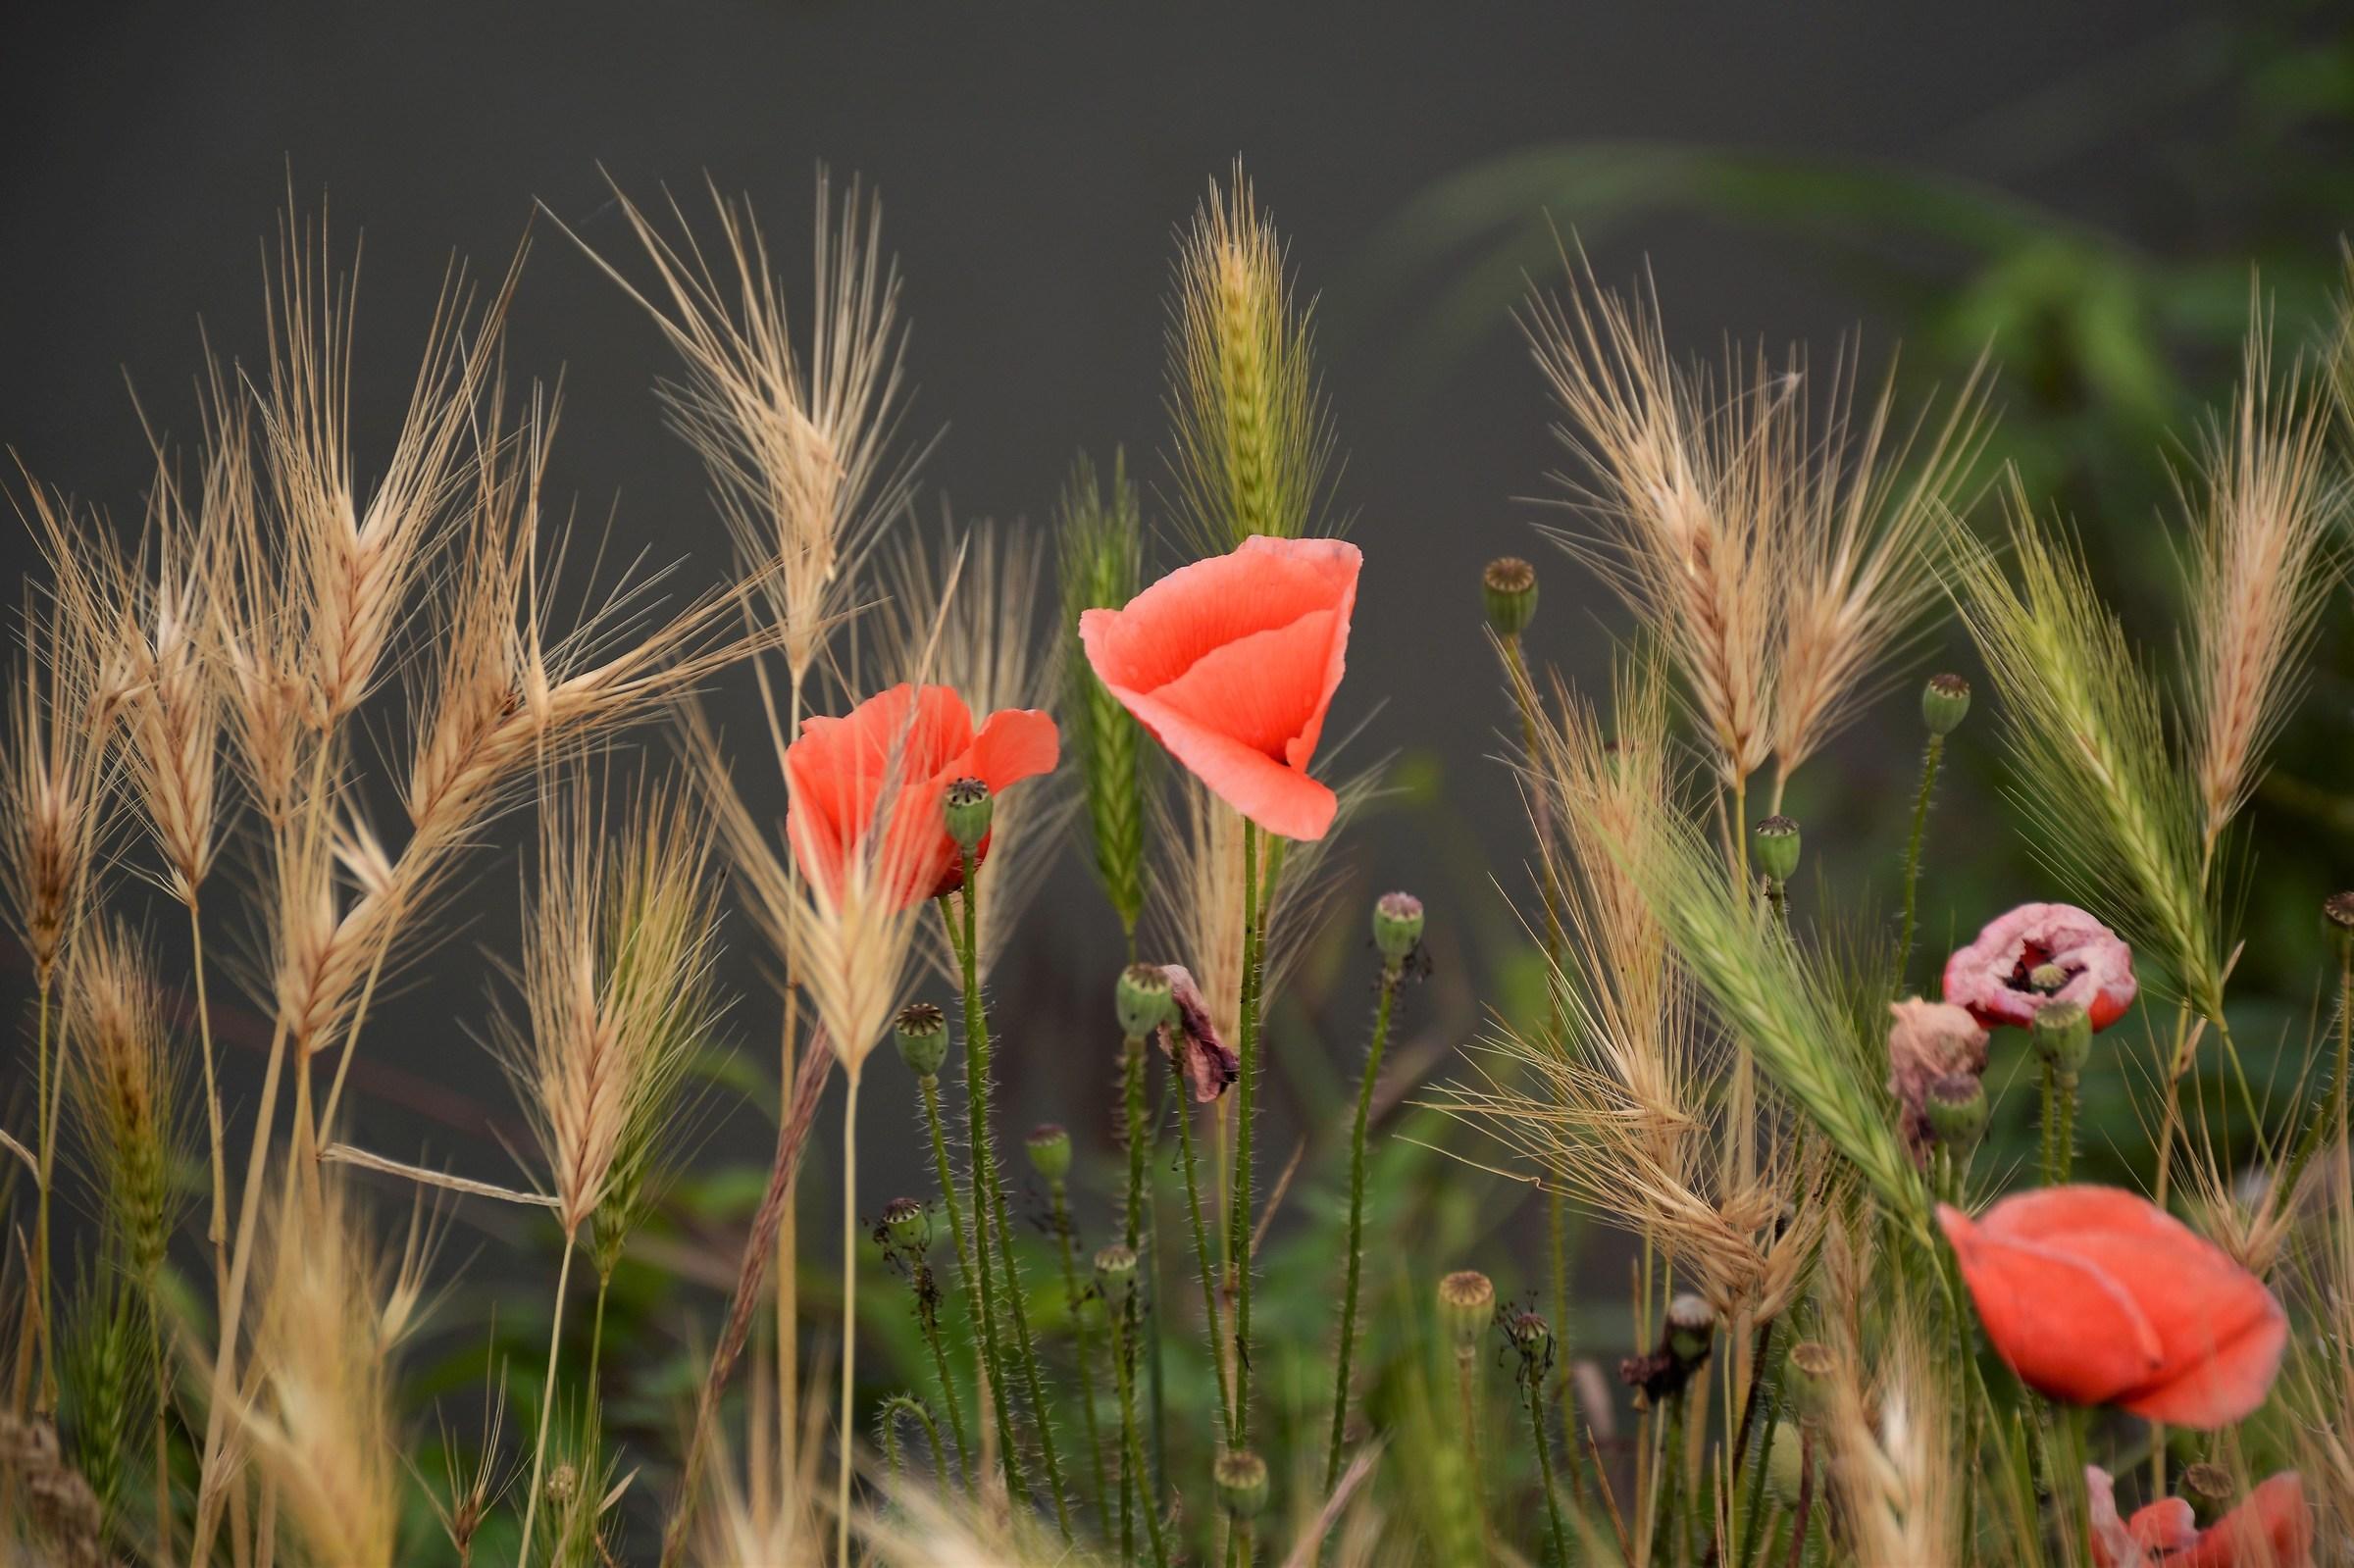 Rural simplicity...